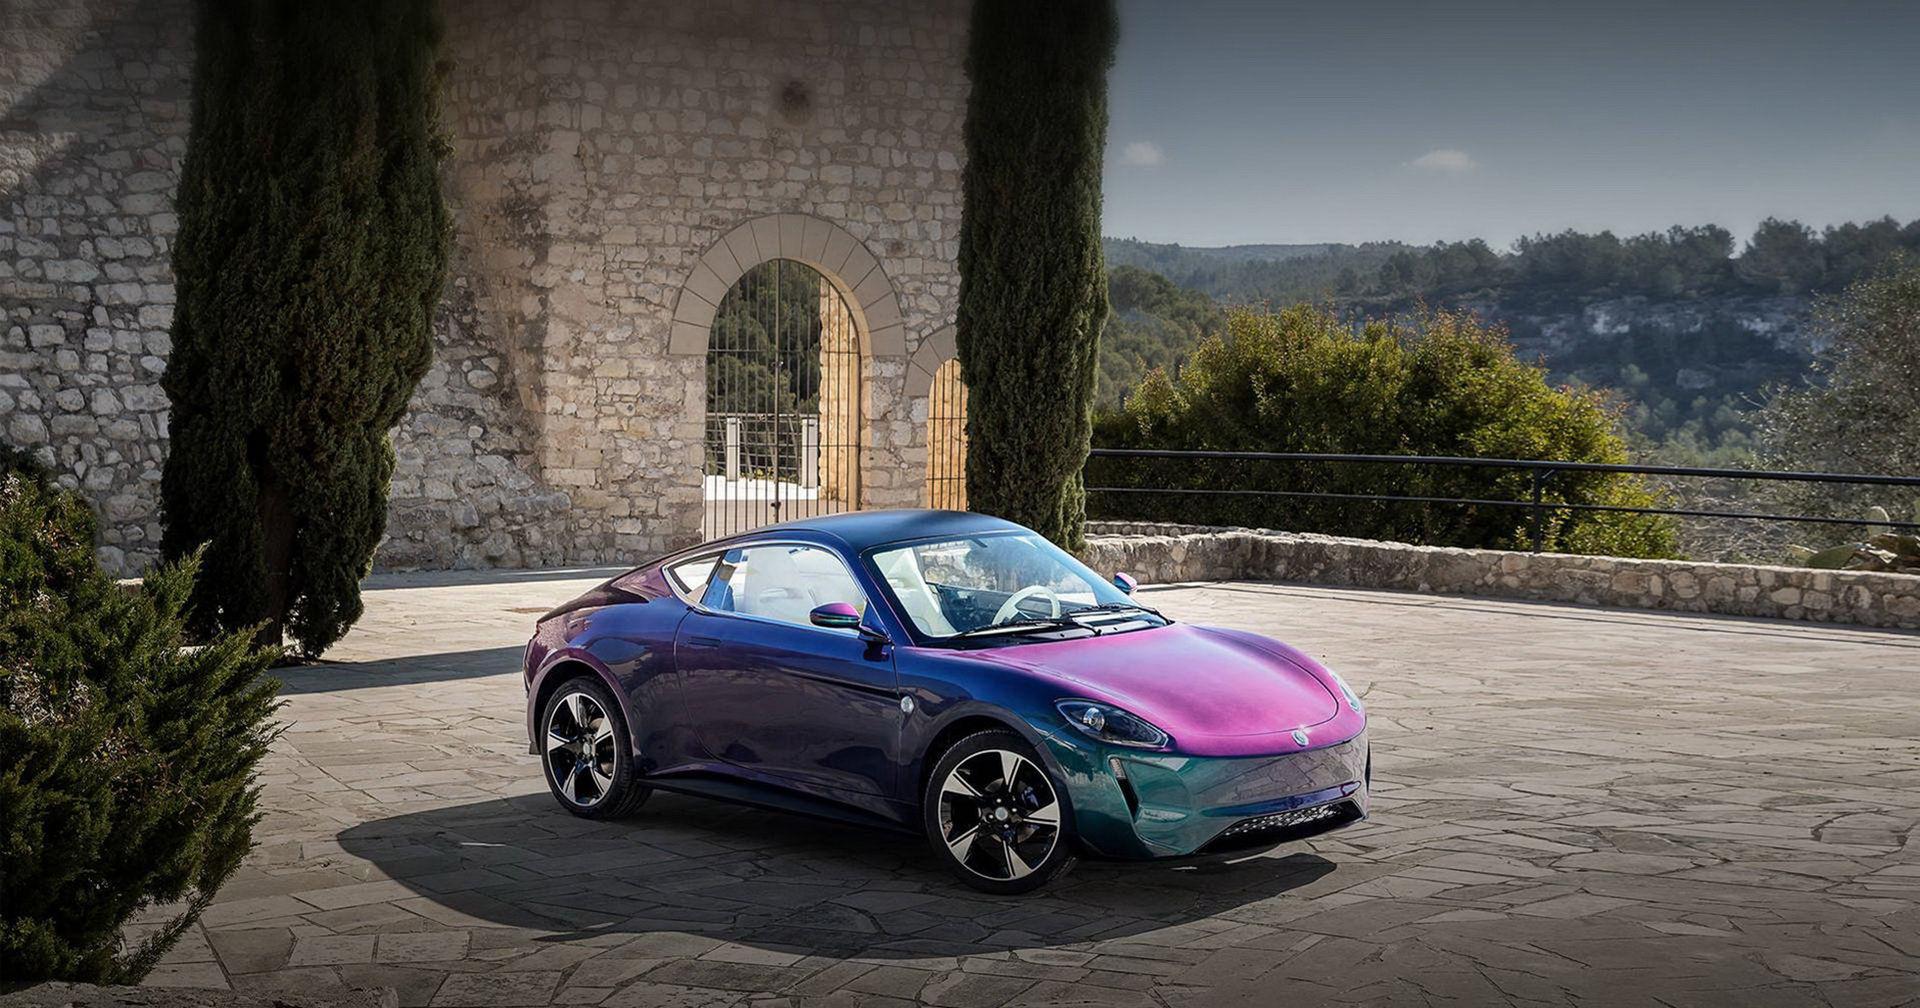 Zedriv visar lilla eldrivna sportbilen GT3